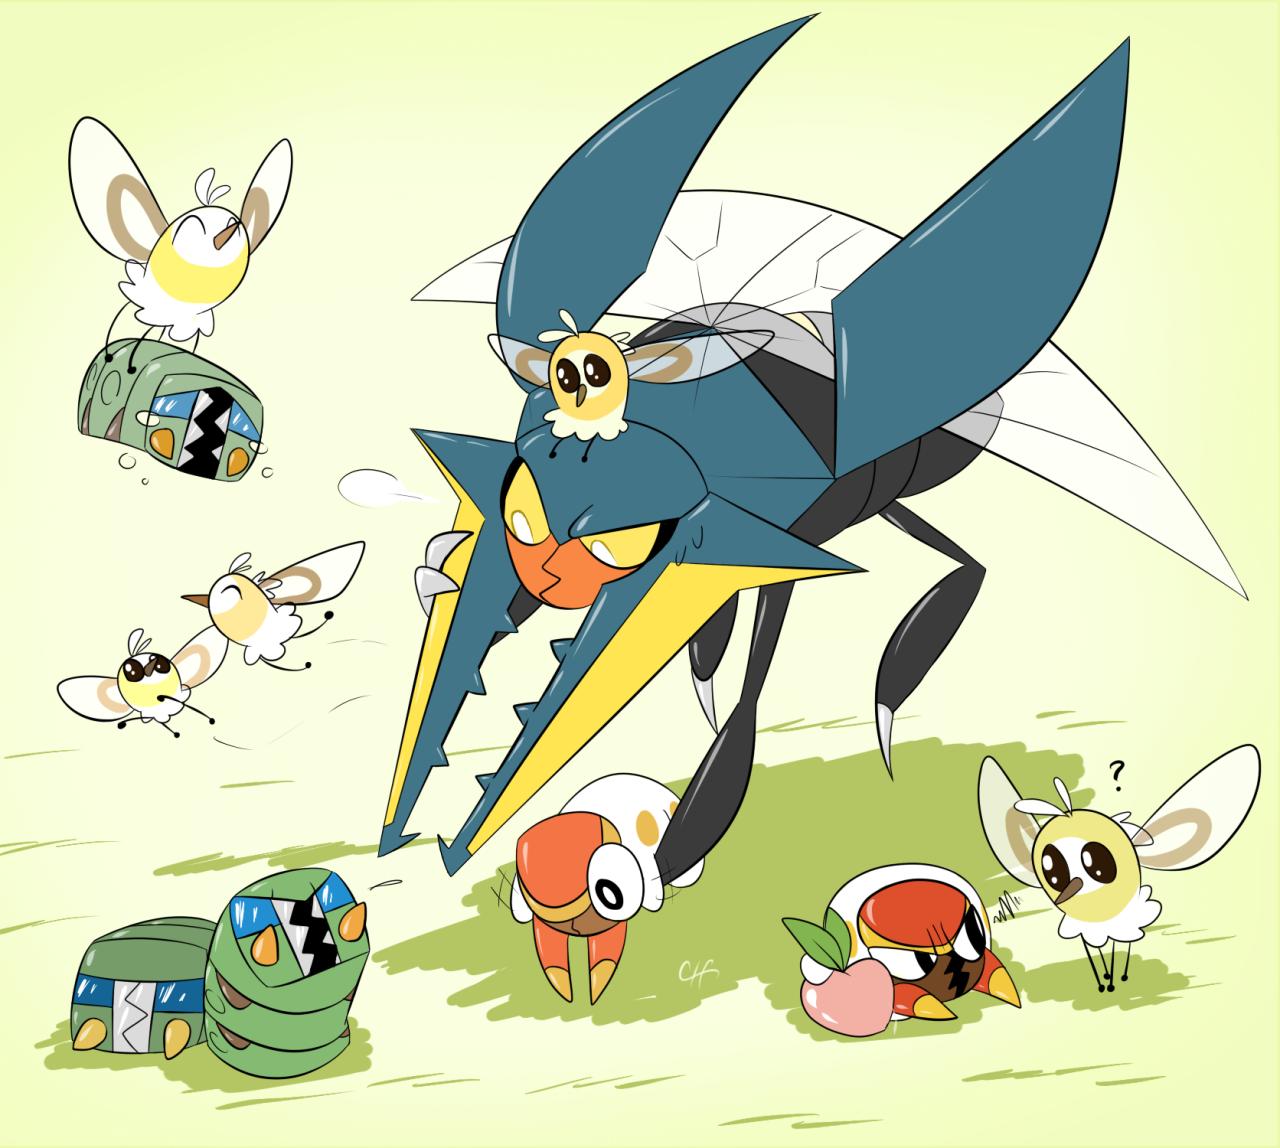 Vikavolt Charjabug Grubbin Cutiefly Pokémon Pinterest